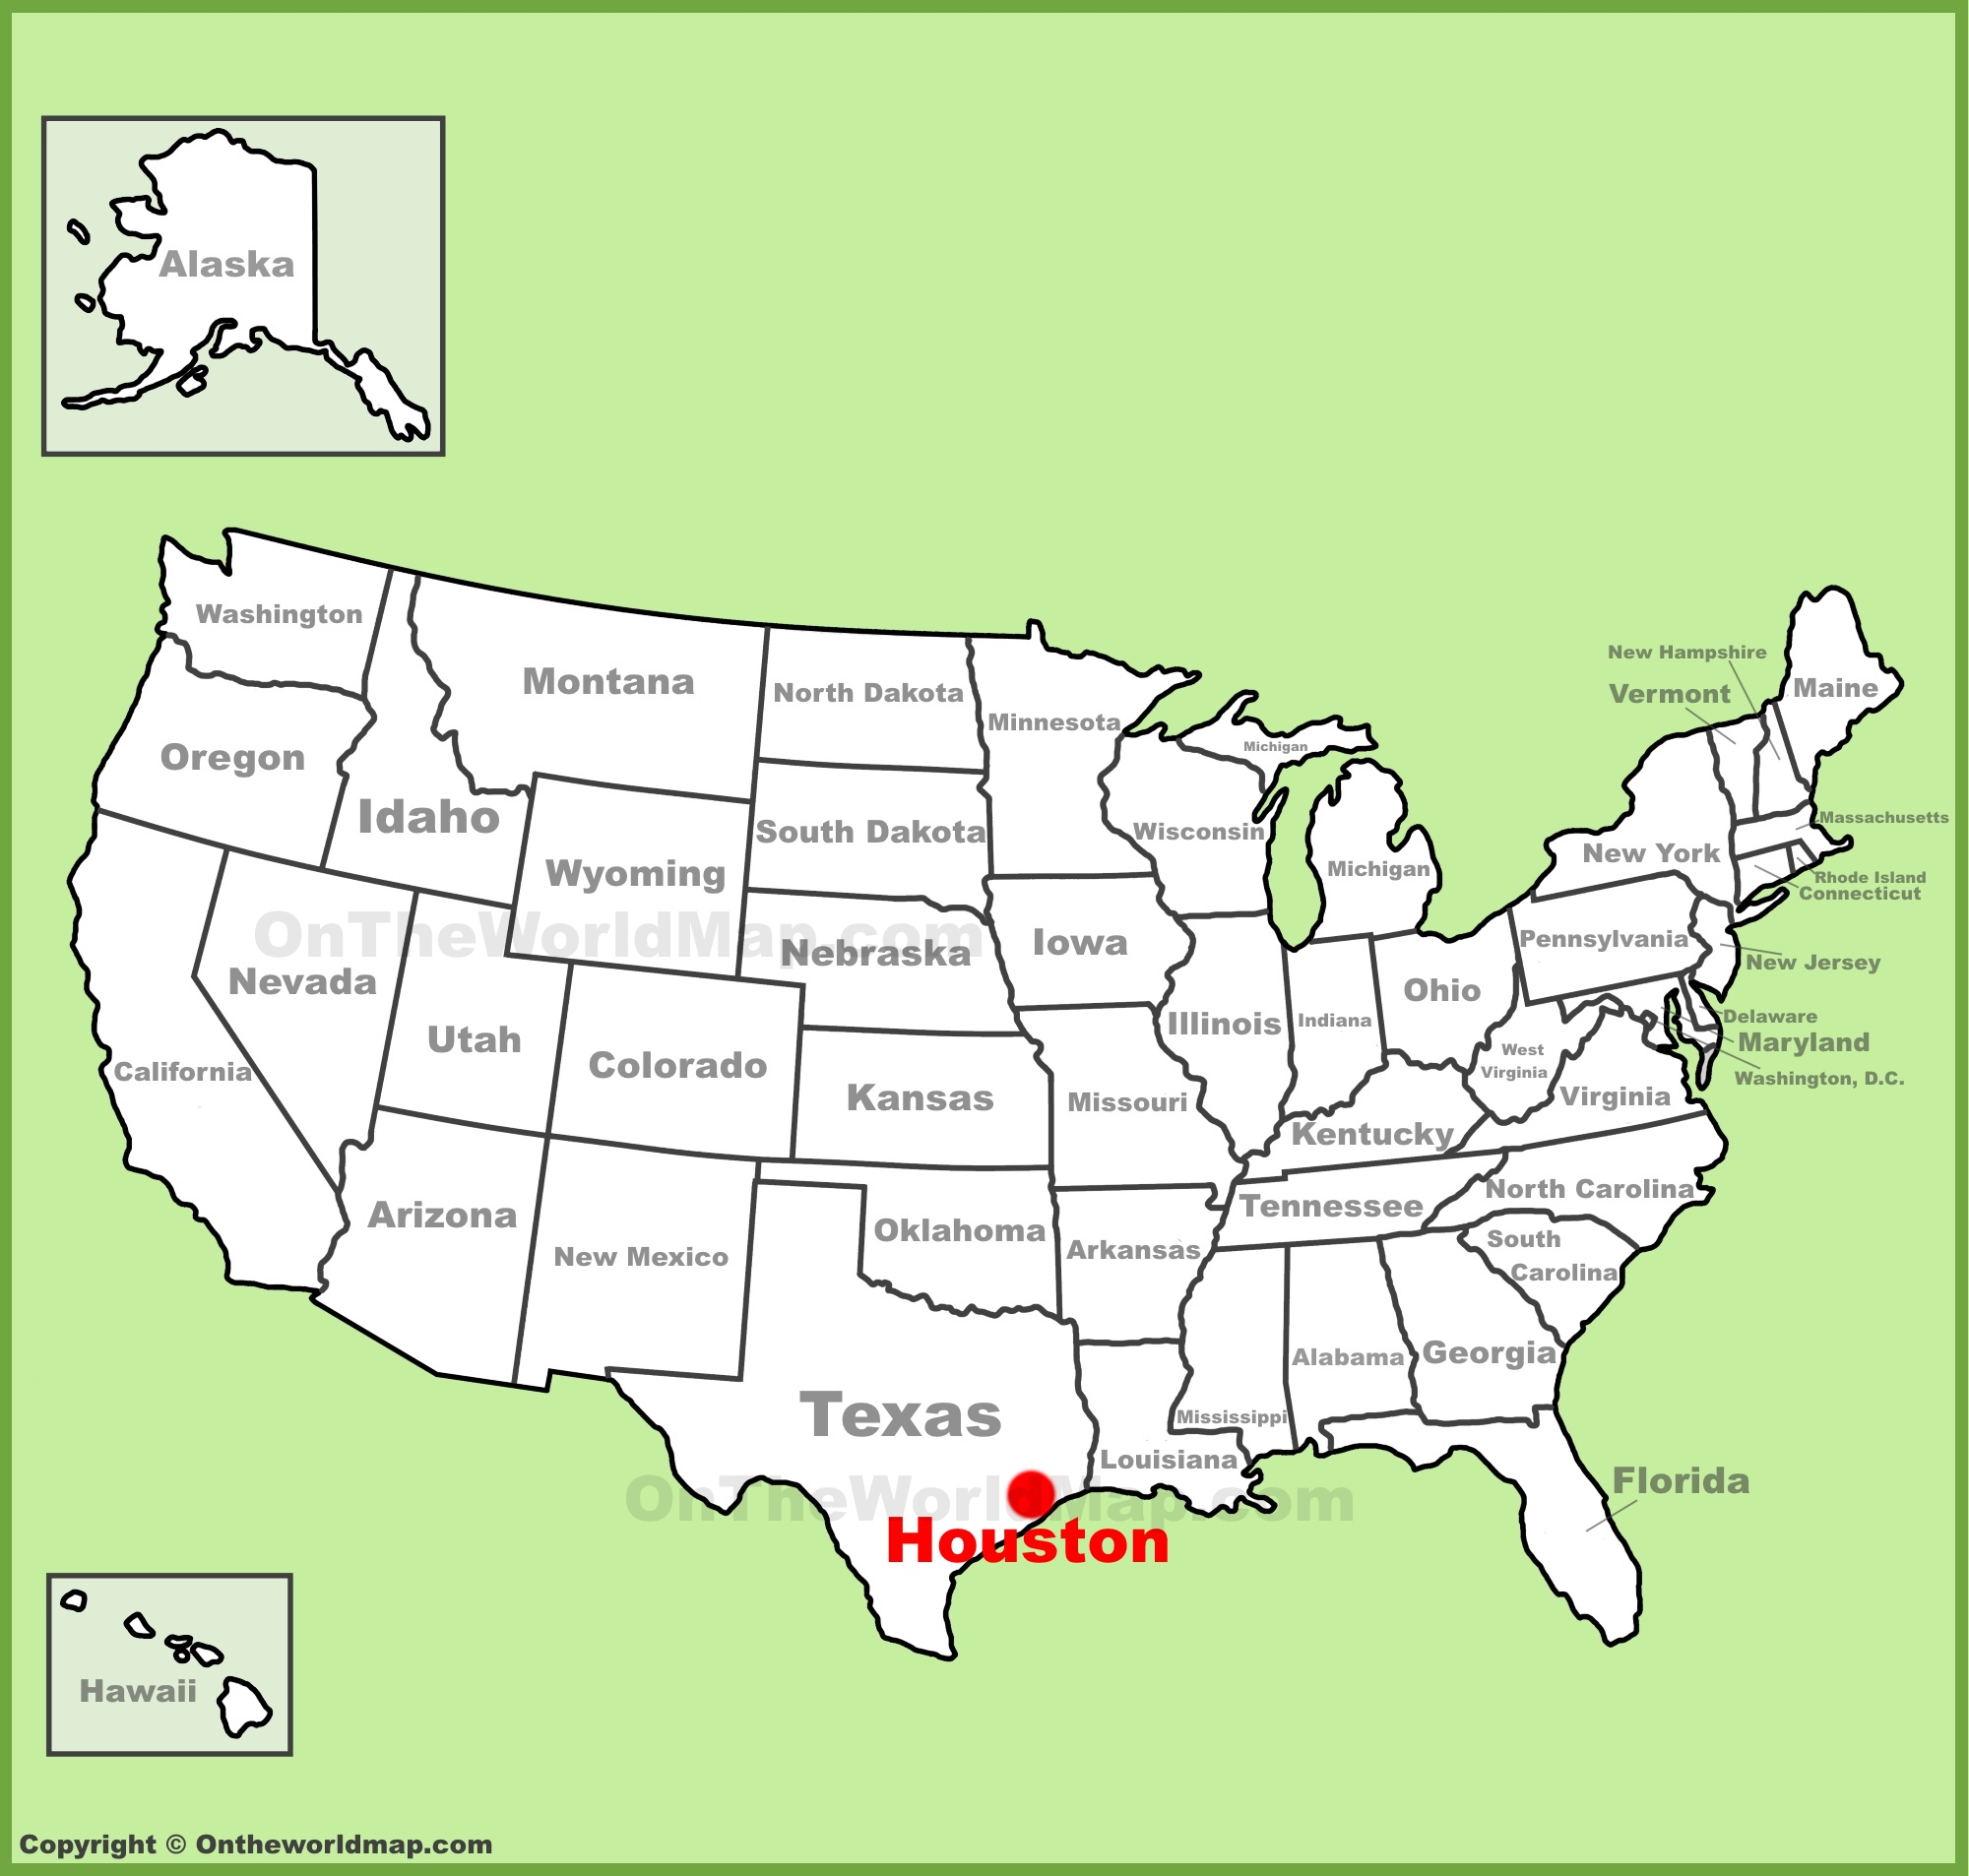 Houston On Map Houston location on the U.S. Map Houston On Map